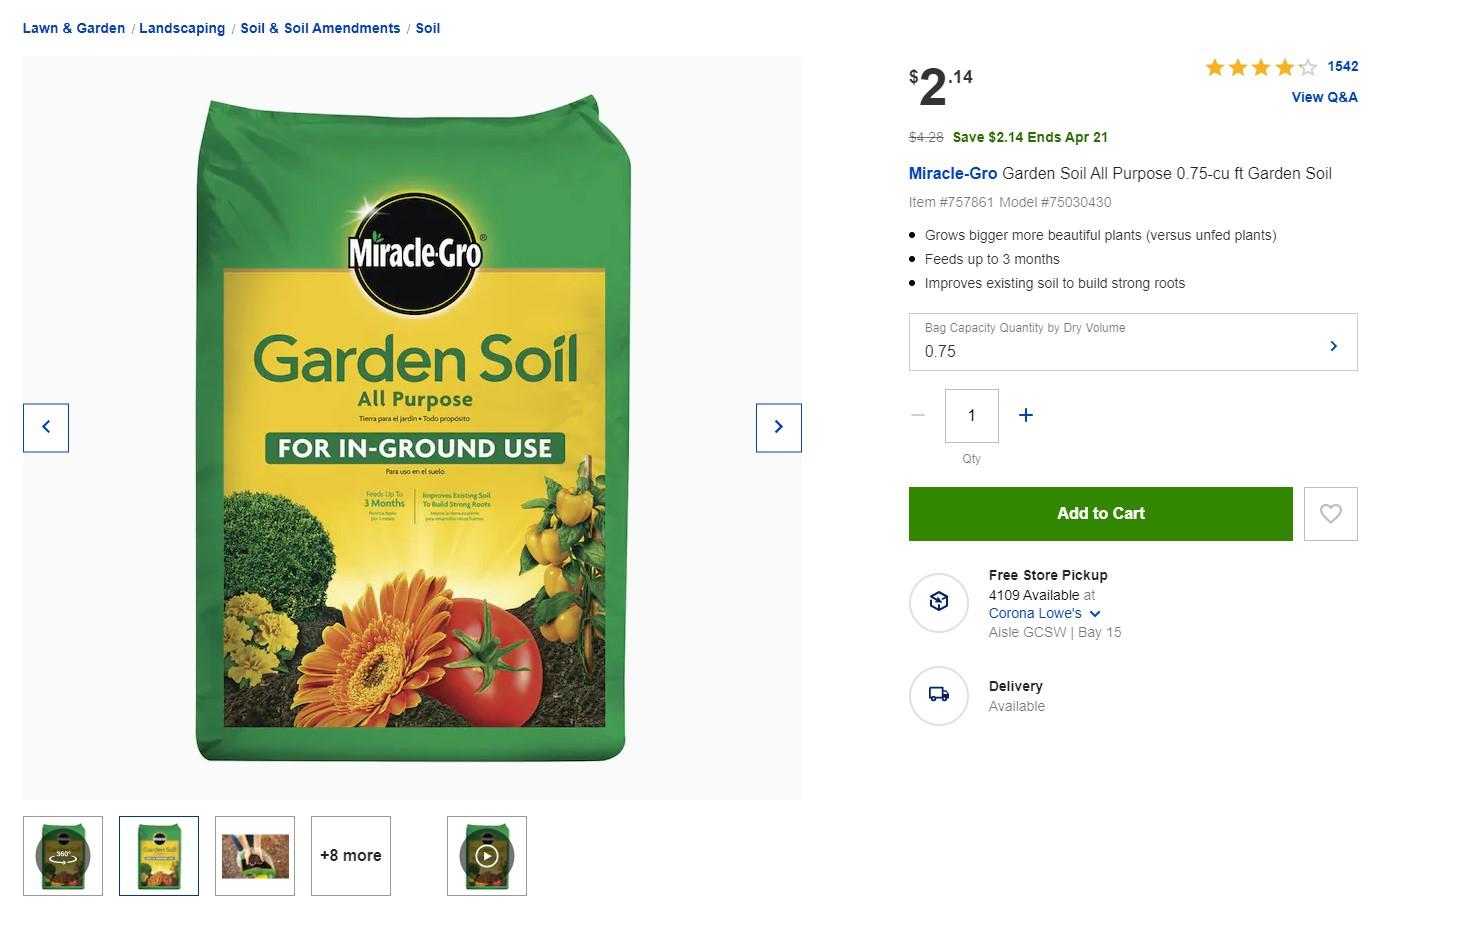 Garden Soil All Purpose 0.75-cu ft Garden Soil   50% OFF $2.14